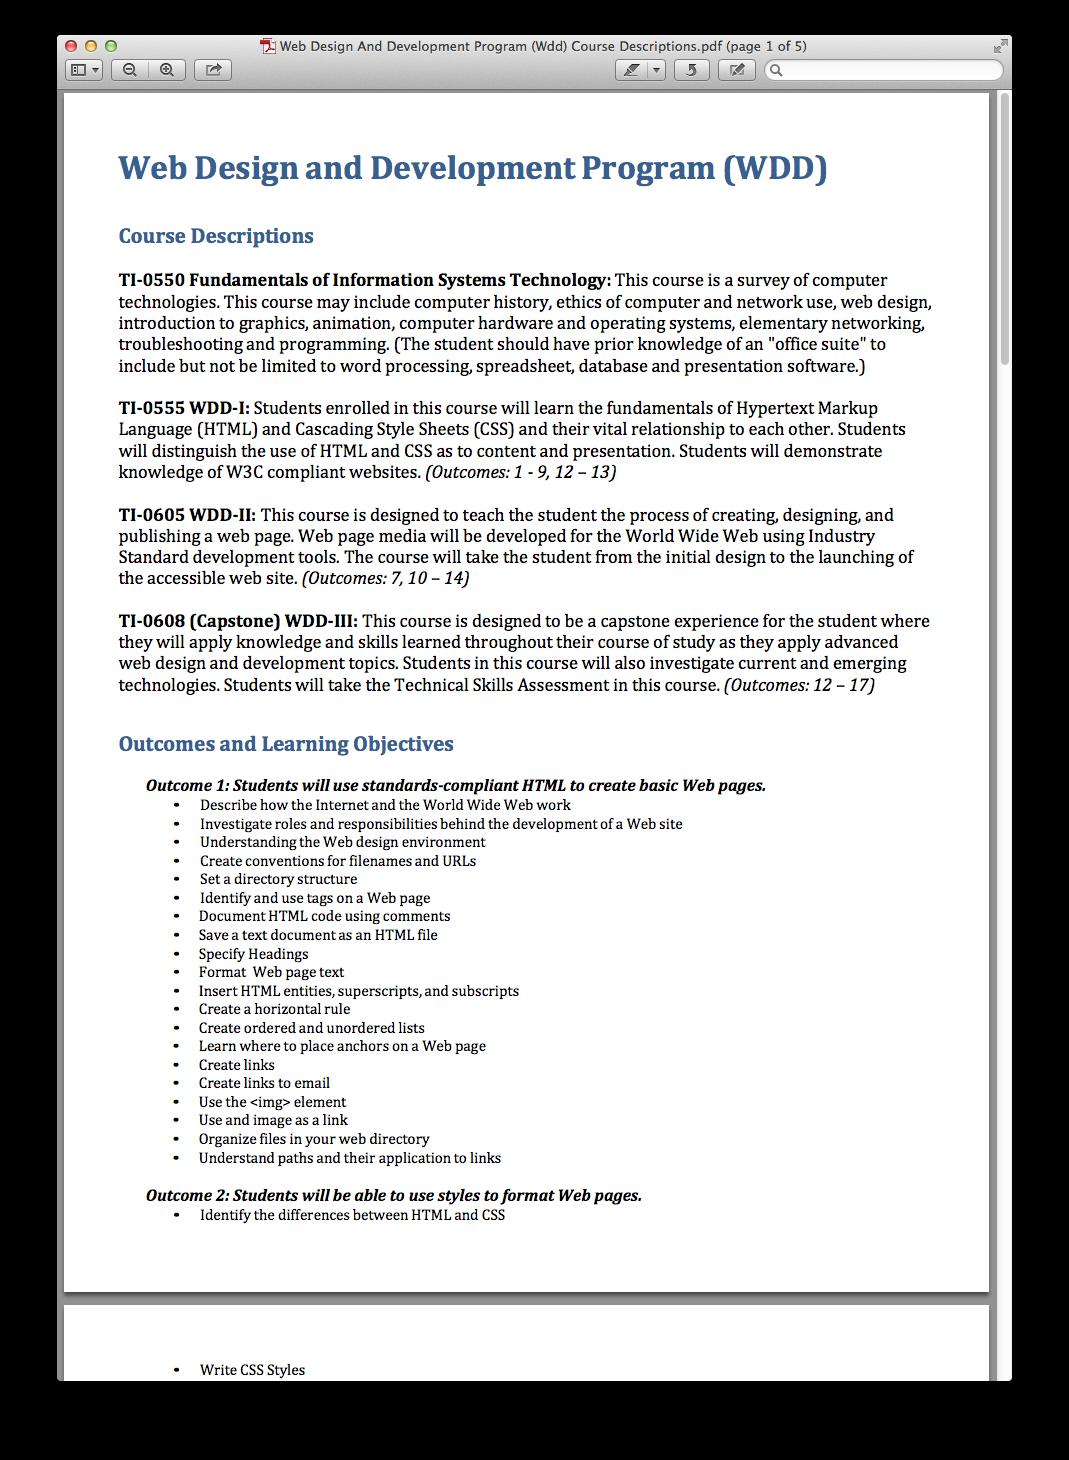 Web Design And Development Program Wdd Course Descriptions Pdf Png 1069 1460 Web Development Design Development Programs Web Design